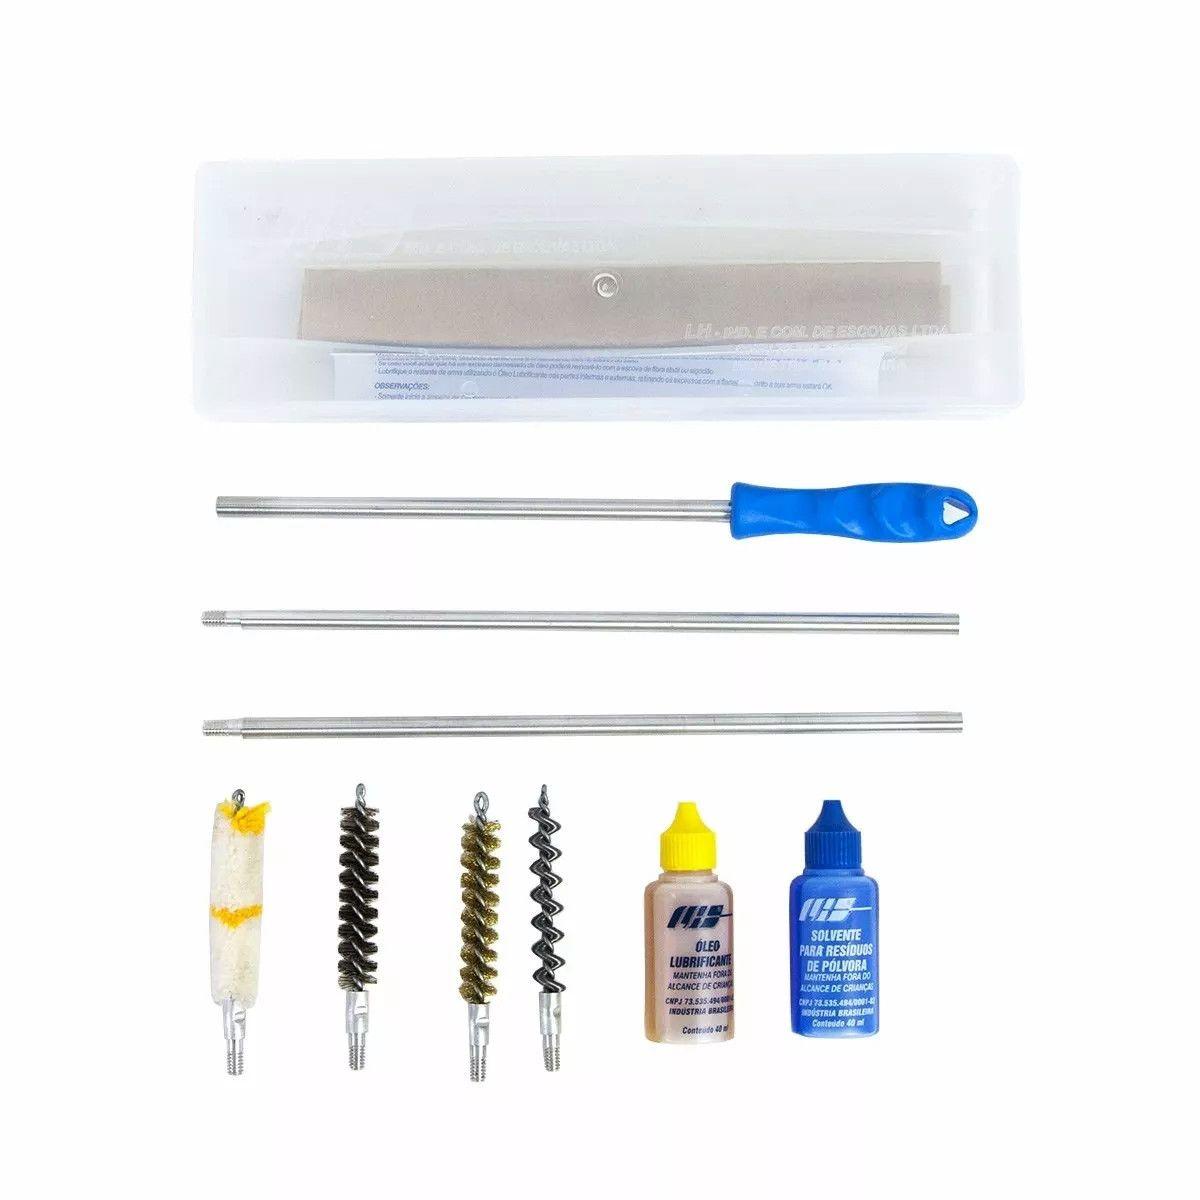 Kit Limpeza LH Caixa Arma Longa - Calibre 36